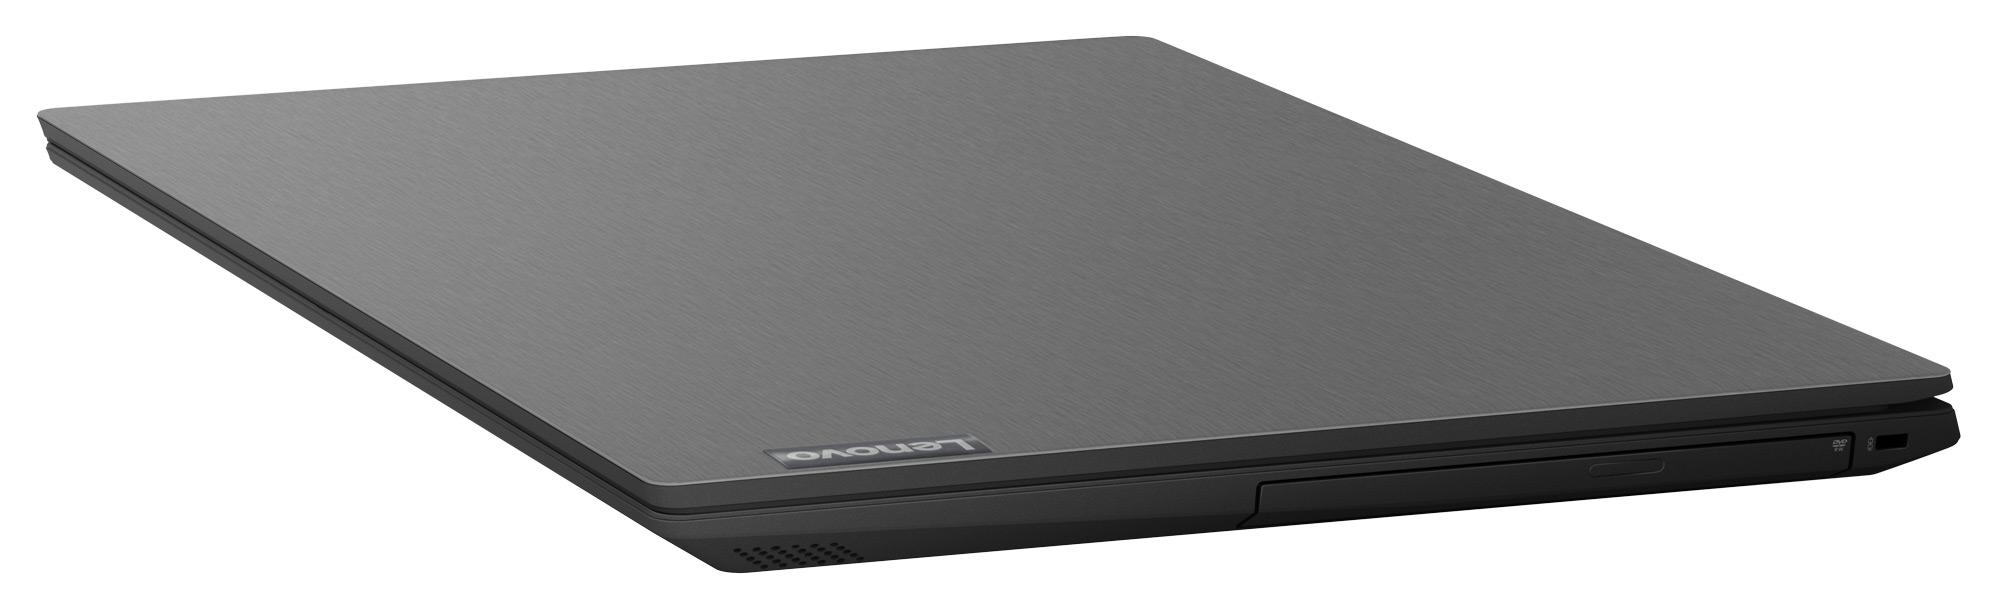 Фото  Ноутбук Lenovo V340-17IWL Iron Grey (81RG000AUA)